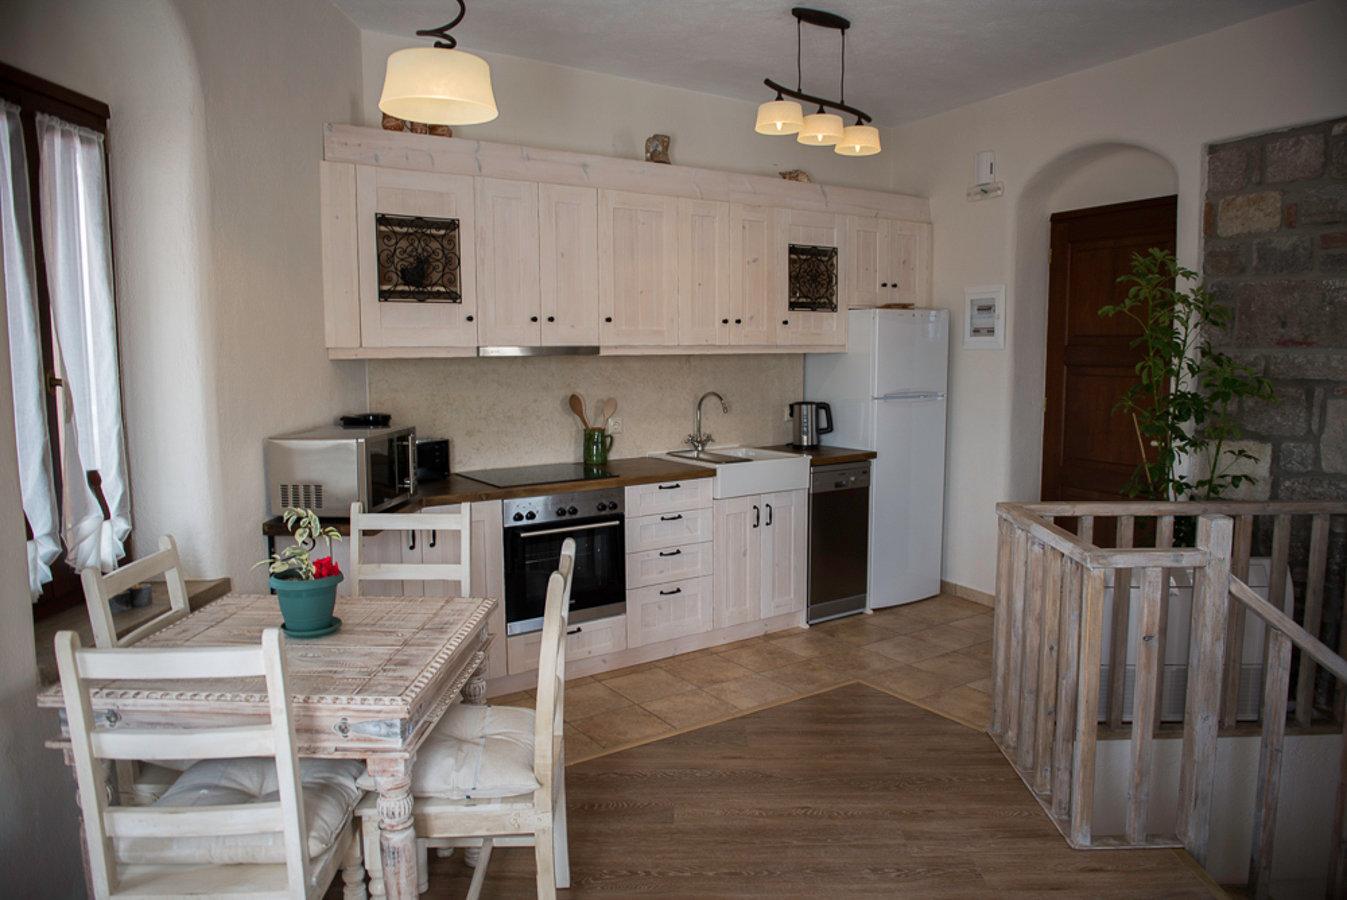 Grand View Rhea - Kitchen